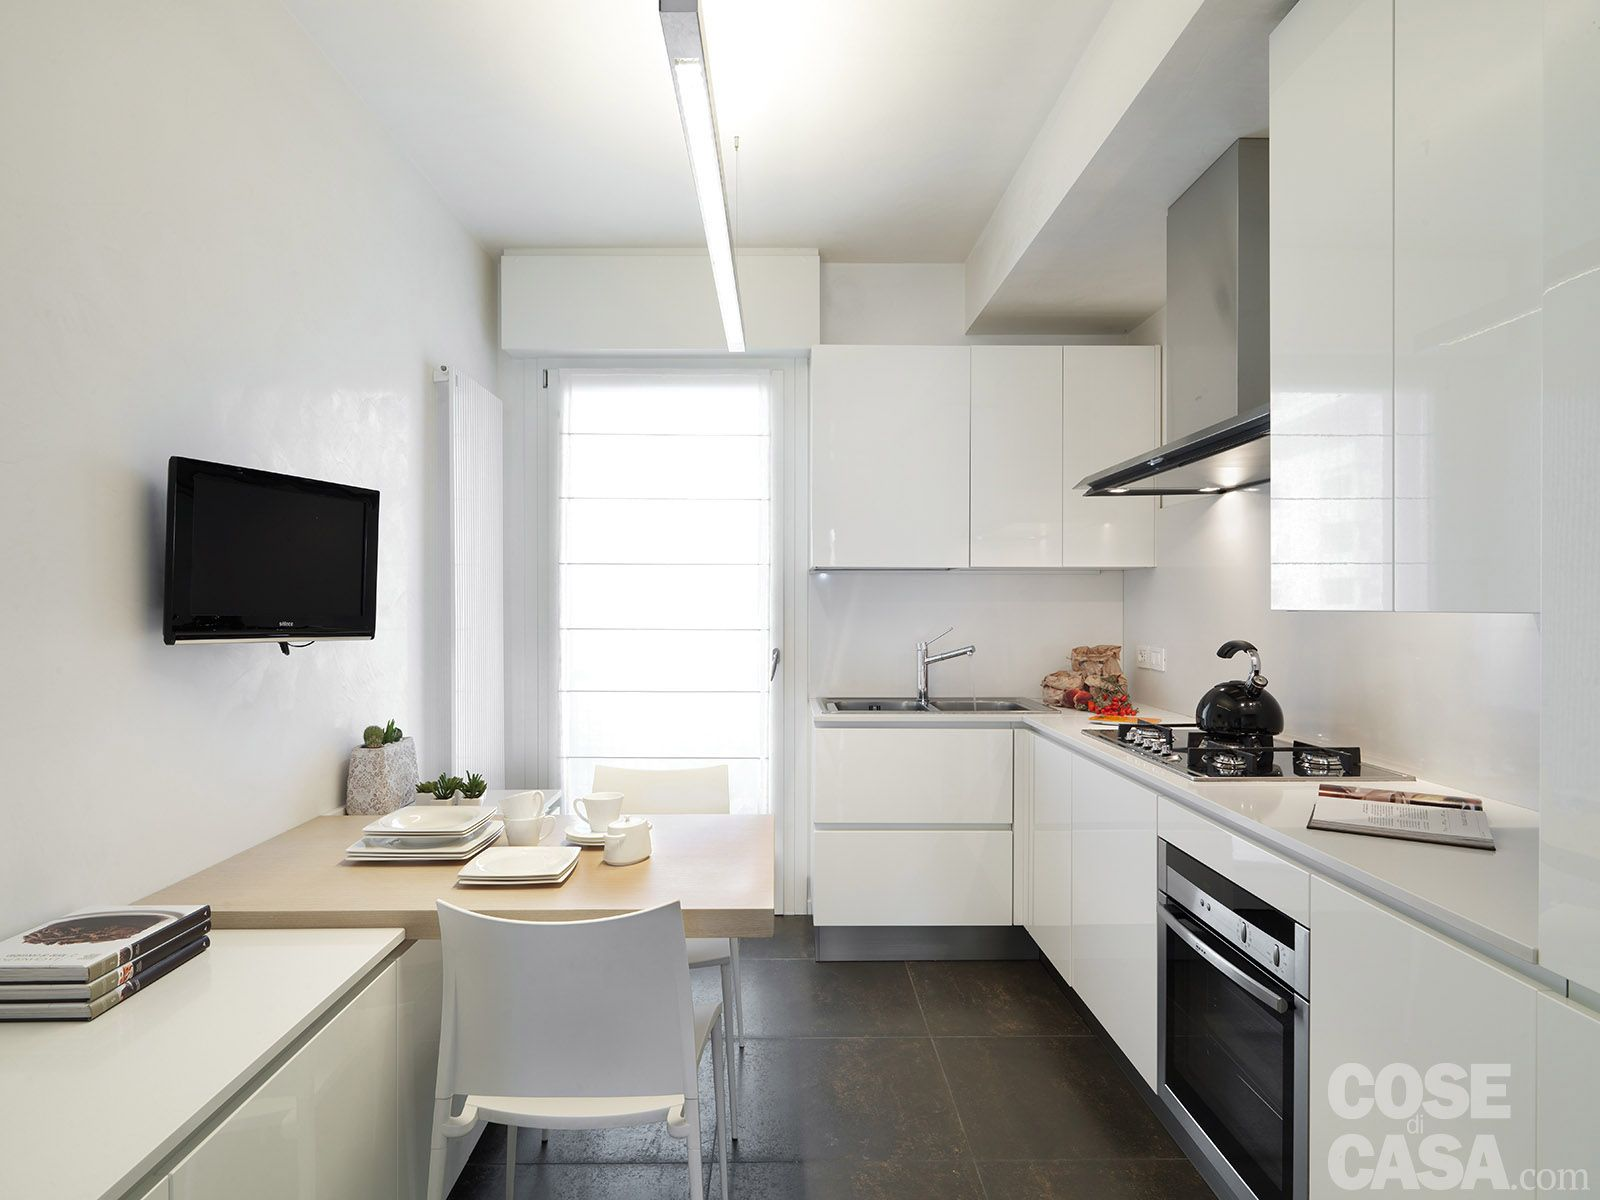 Cucina con finestra sul salotto google search cocinas - Cucina con finestra ...